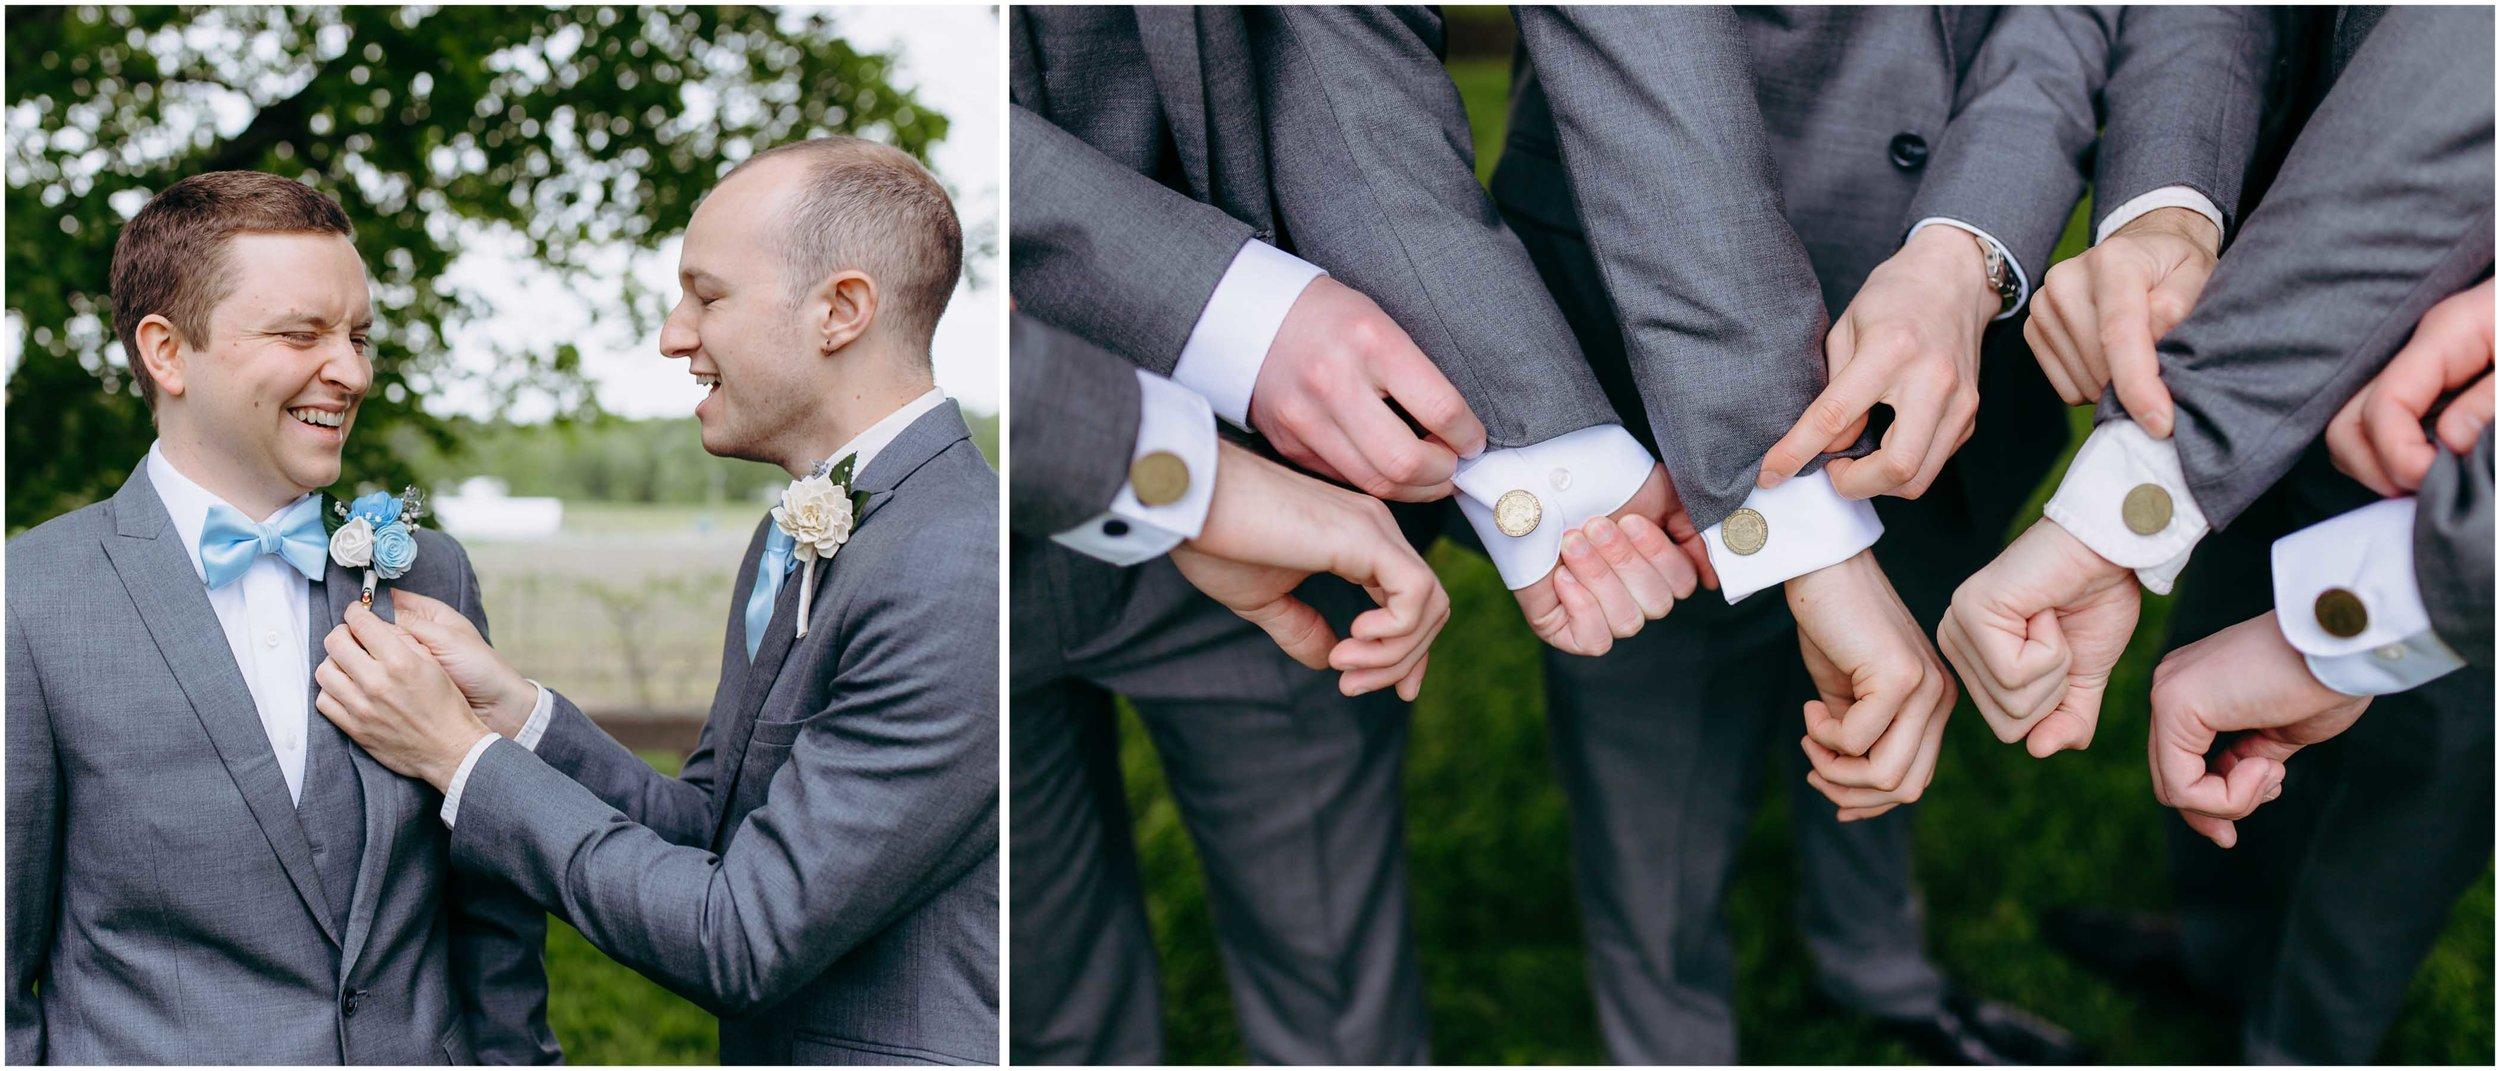 NH Wedding Photographer, NH Wedding Photography at Flag Hill Distillery & Winery in Lee, New Hampshire, groom, groomsmen, cufflinks